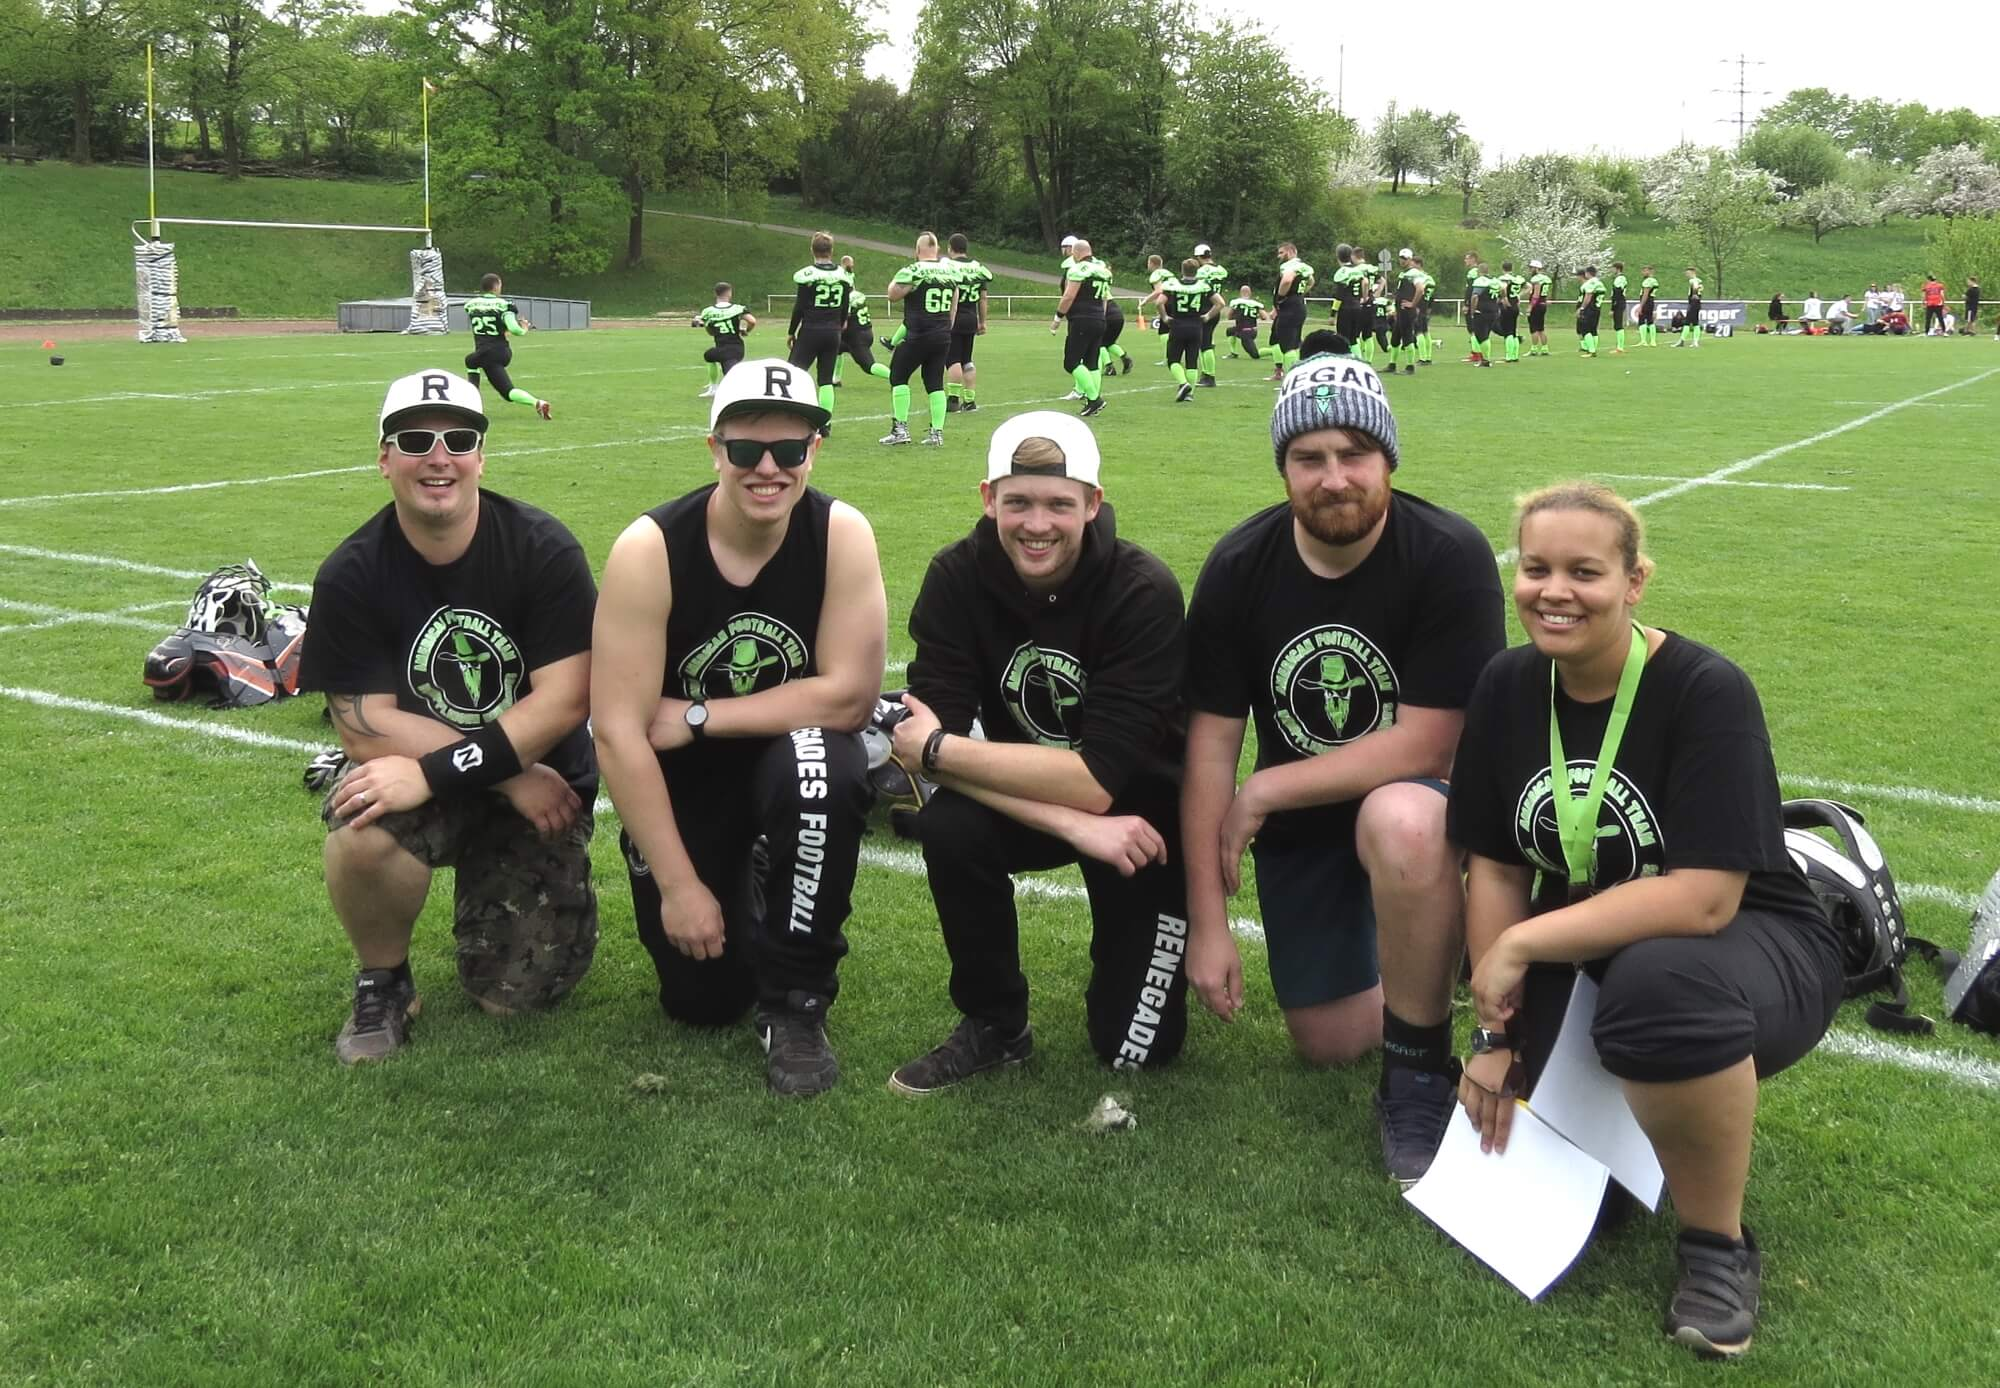 American Football Kollektion <br>Teamwear für junge Mannschaft